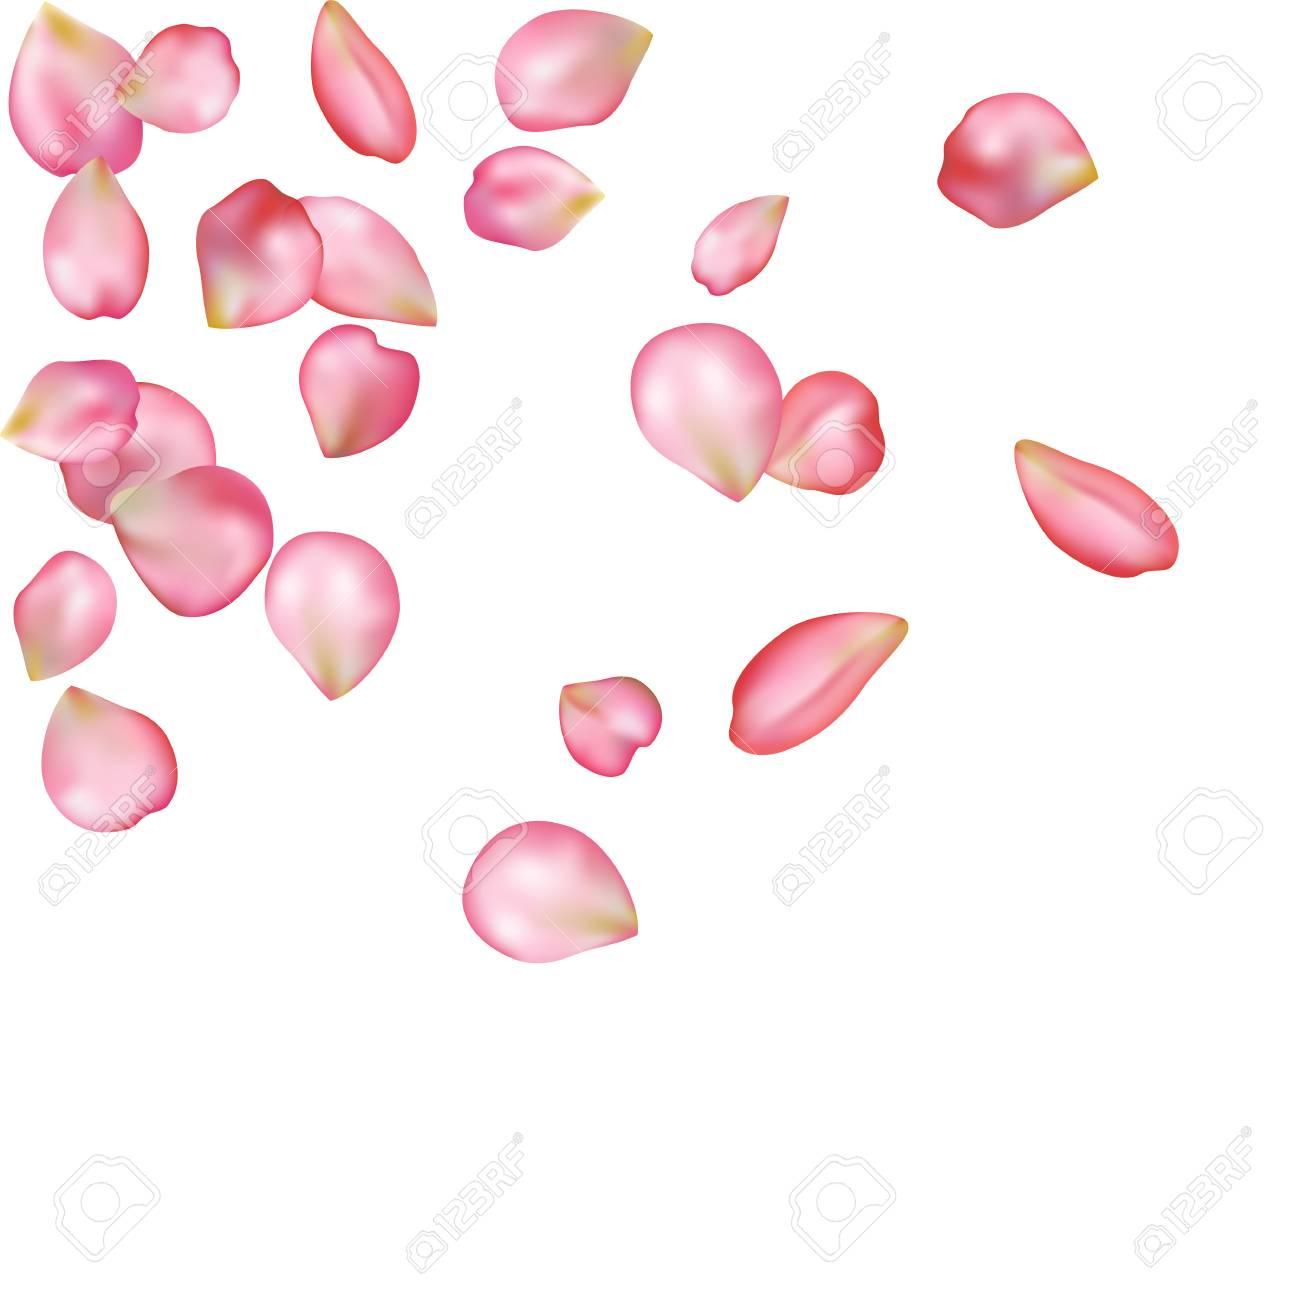 Spring flower petals blossoms blank background template royalty spring flower petals blossoms blank background template stock vector 76556846 mightylinksfo